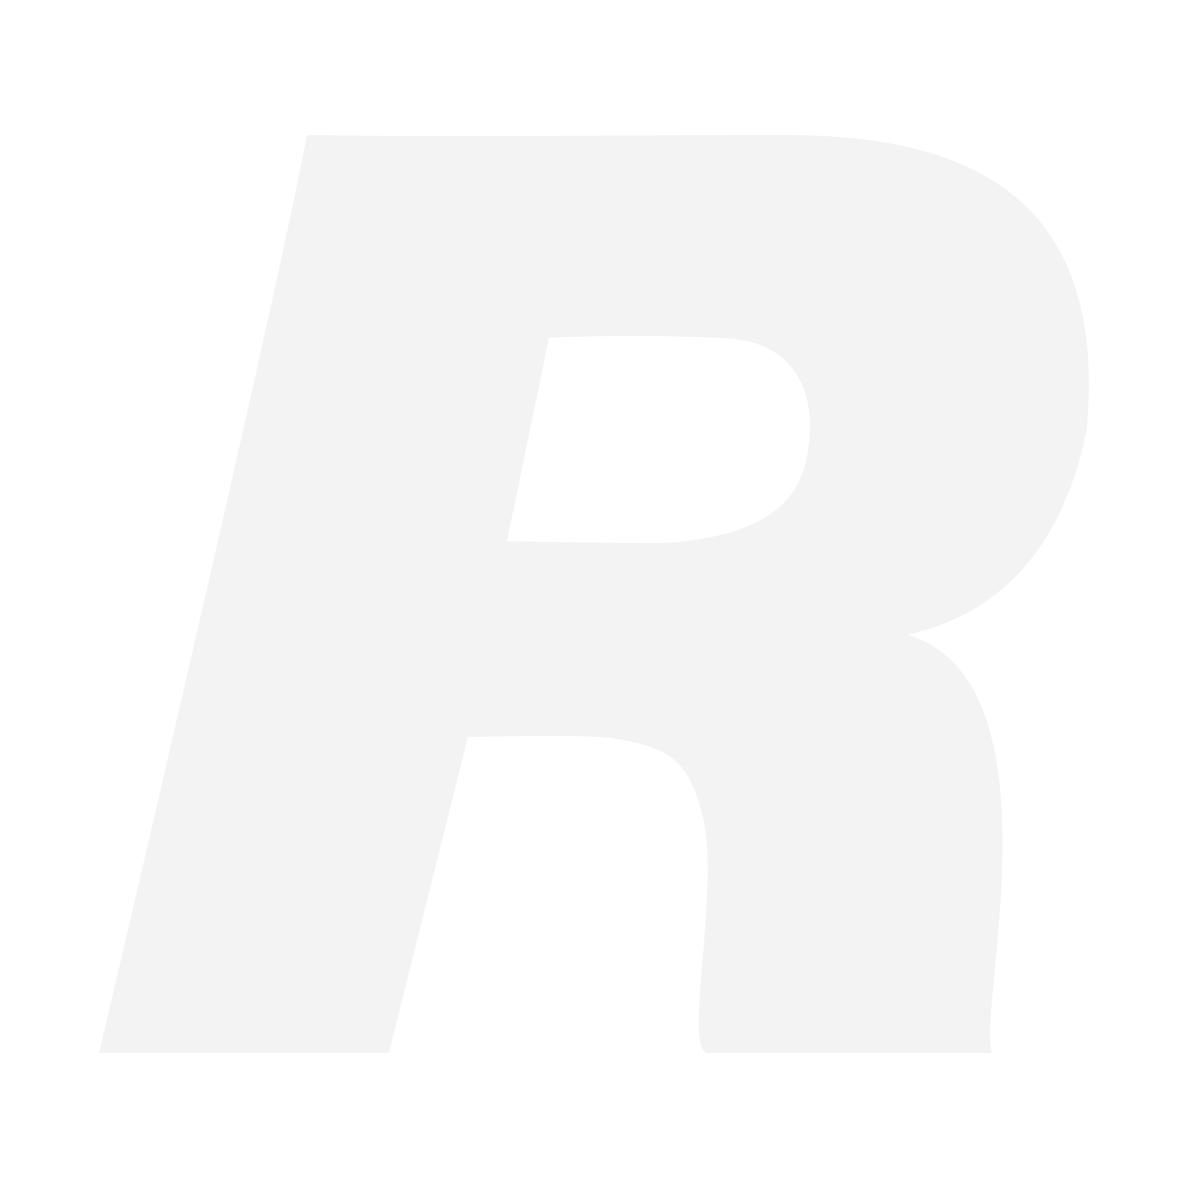 Sony A7R Mark II Käytetty + FE 24-70mm f/4 ZA OSS -pakettitarjous